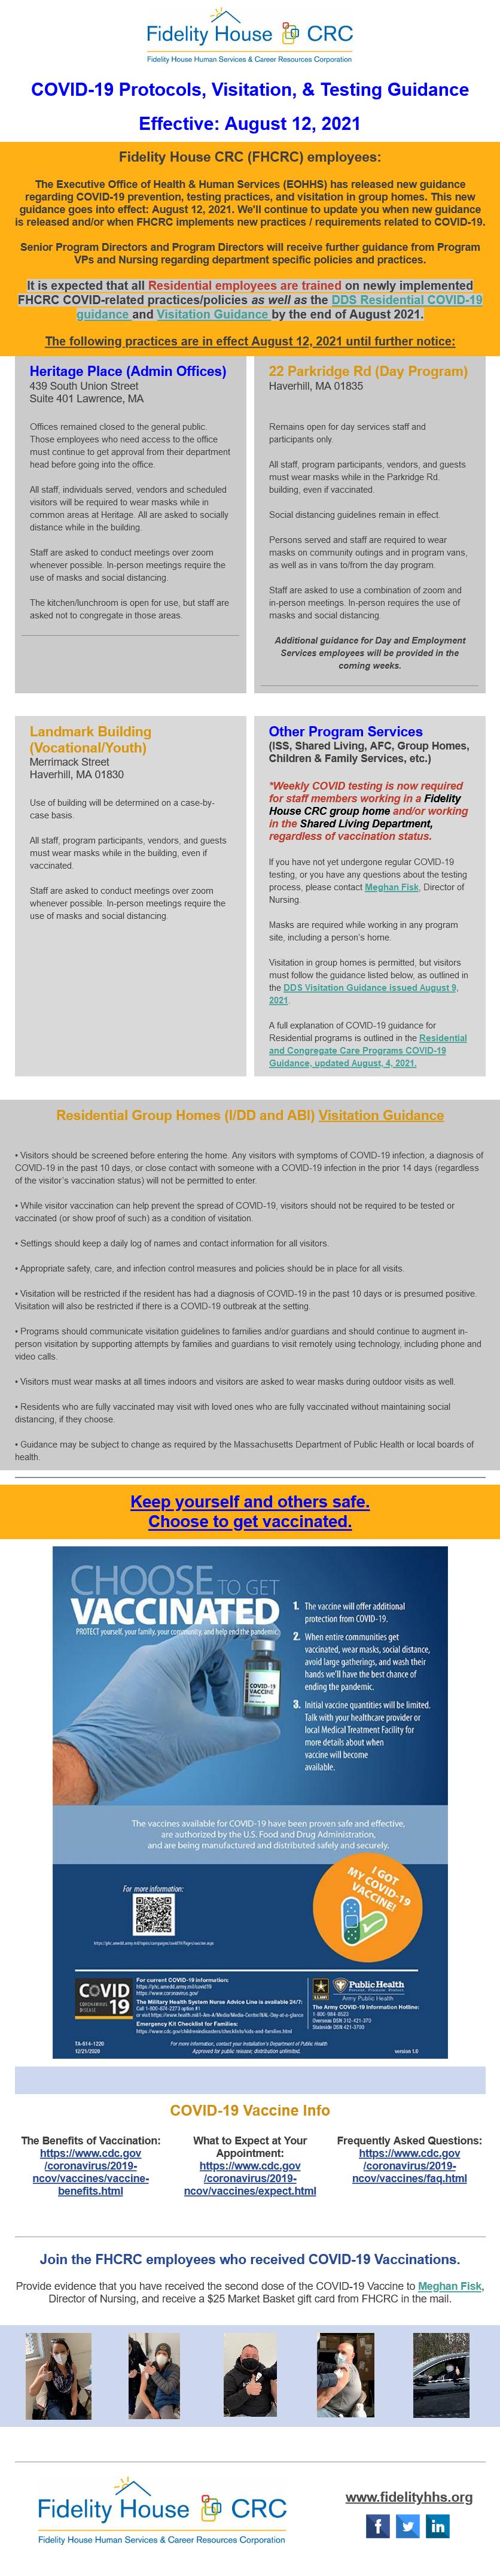 COVID Protocols, Visitation, and Testing Guidance 8/12/21